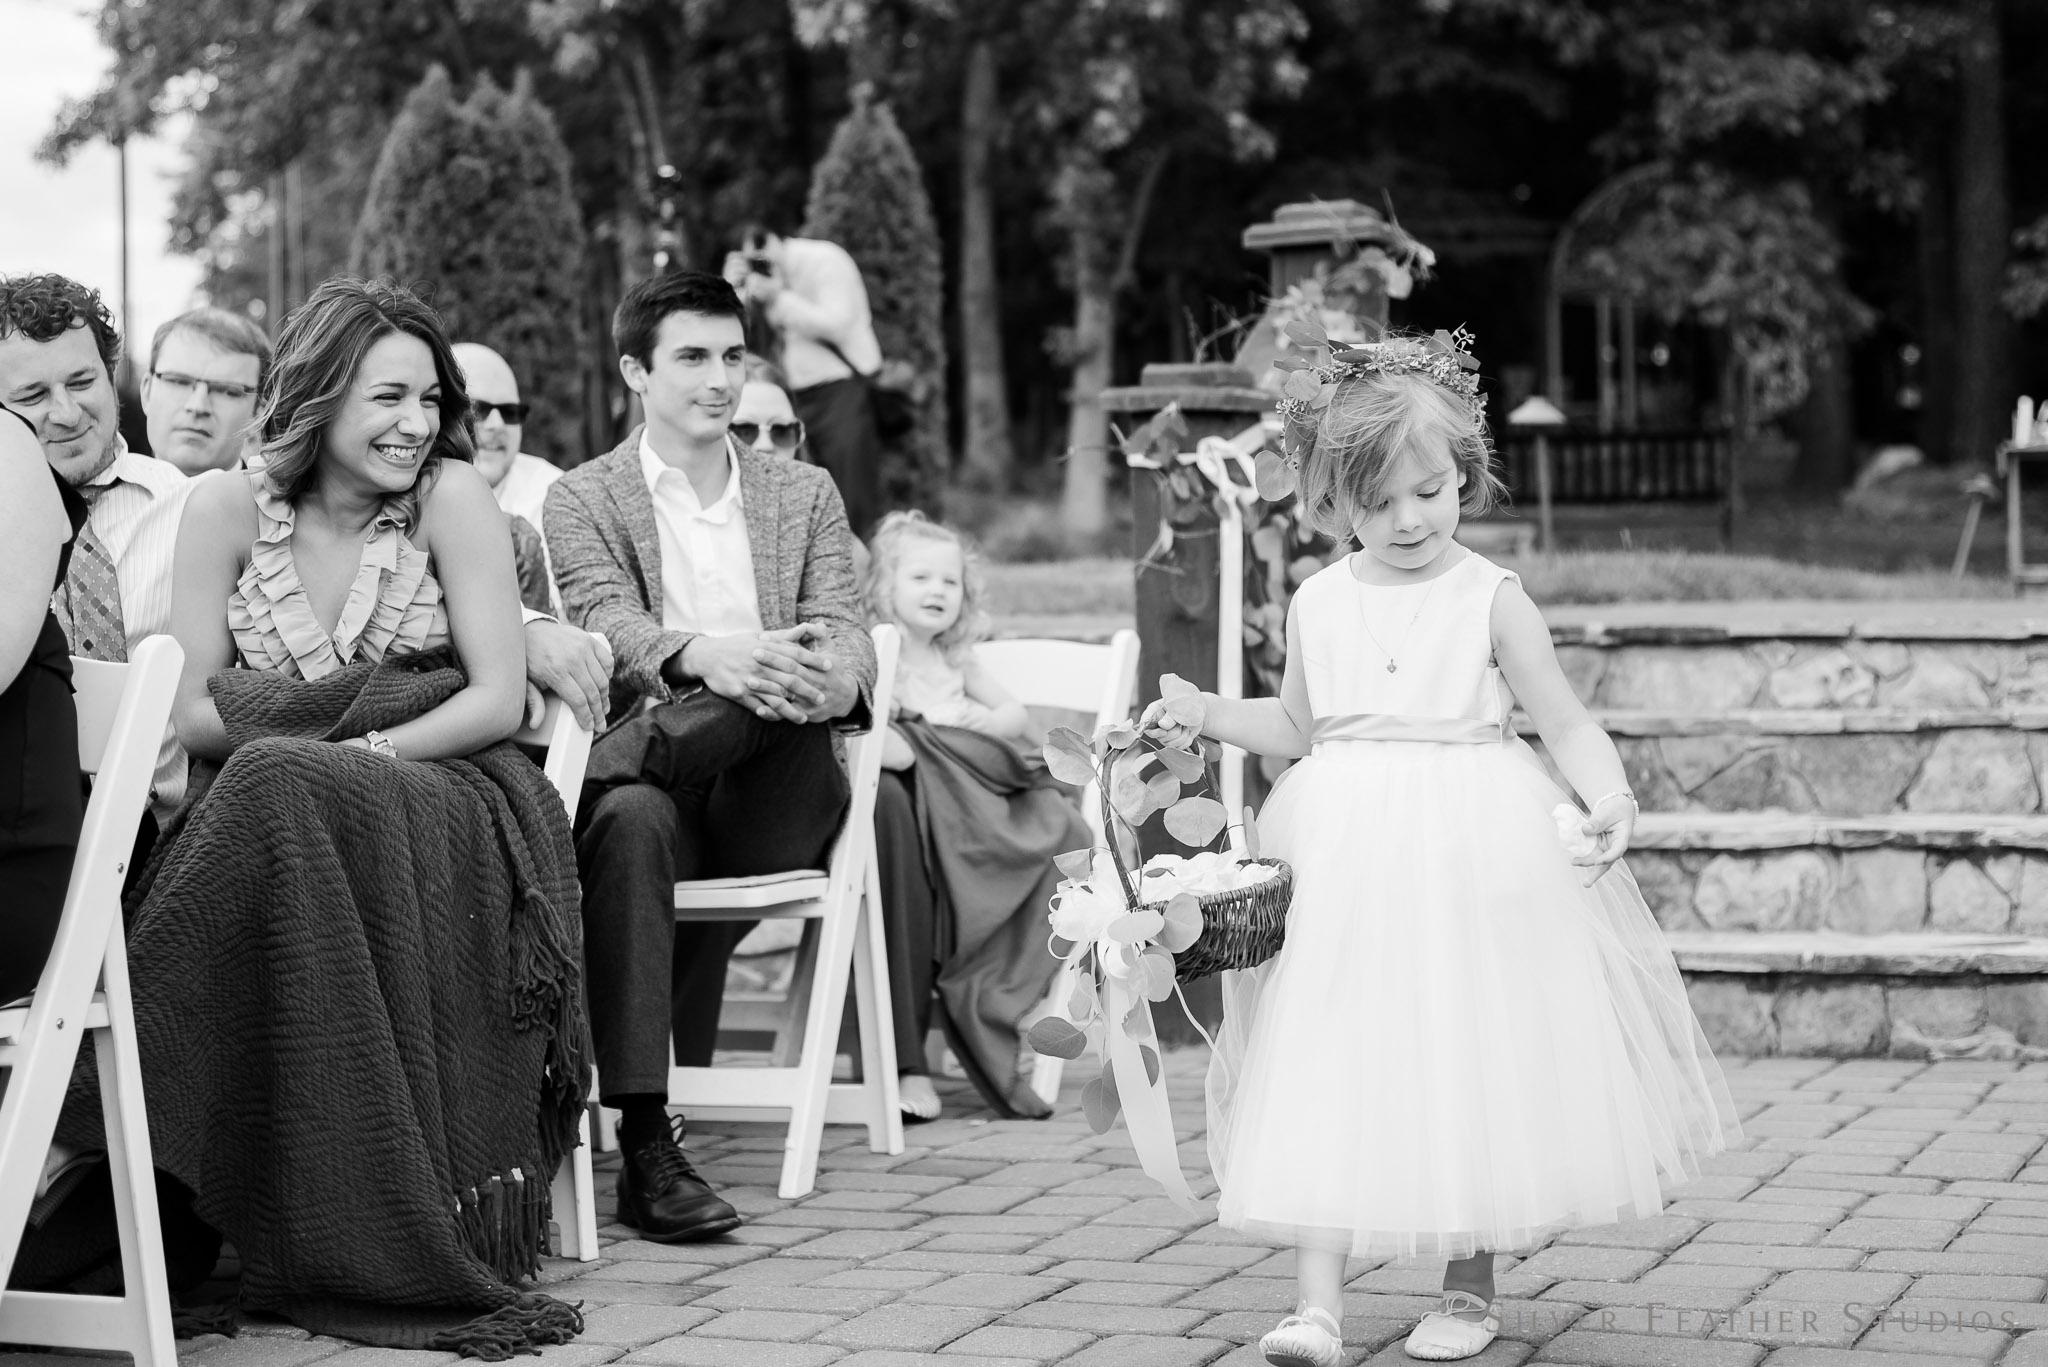 the blog Spontaneous North Carolina Wedding graphy